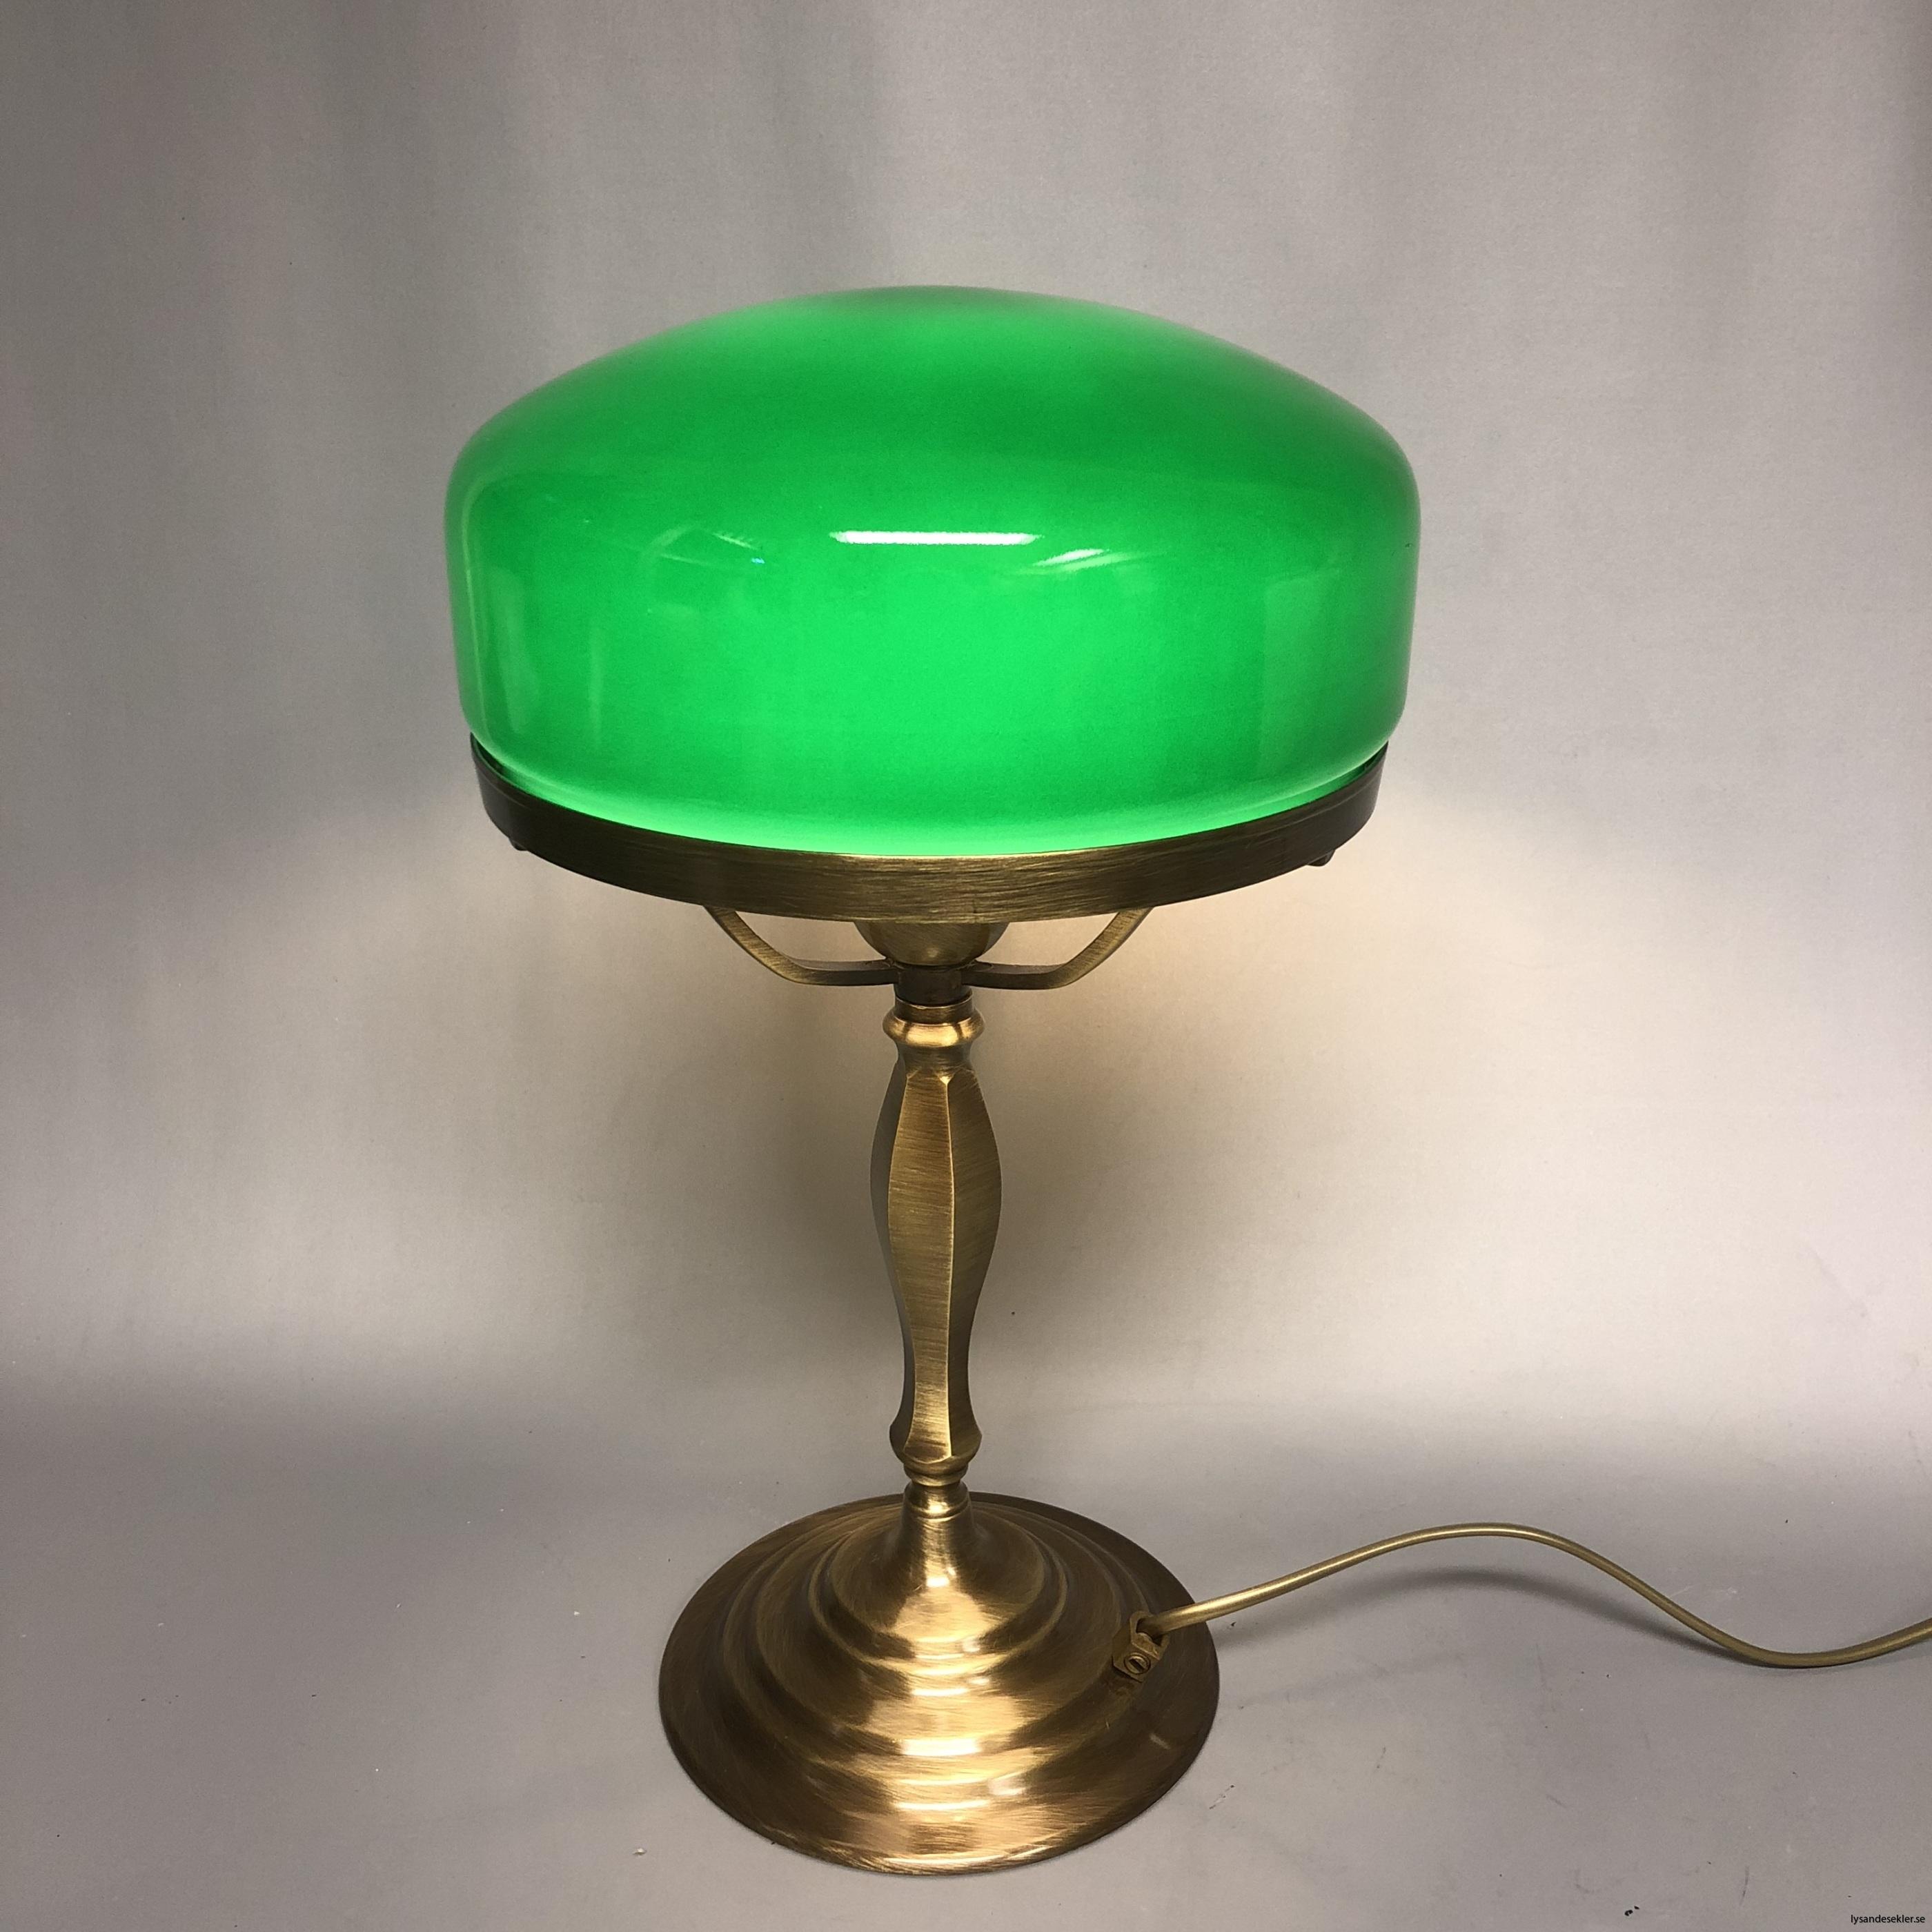 strindbergslampa strindbergslampor strindberg lampa skärm kupa strindbergsskärm strindbergskupa32